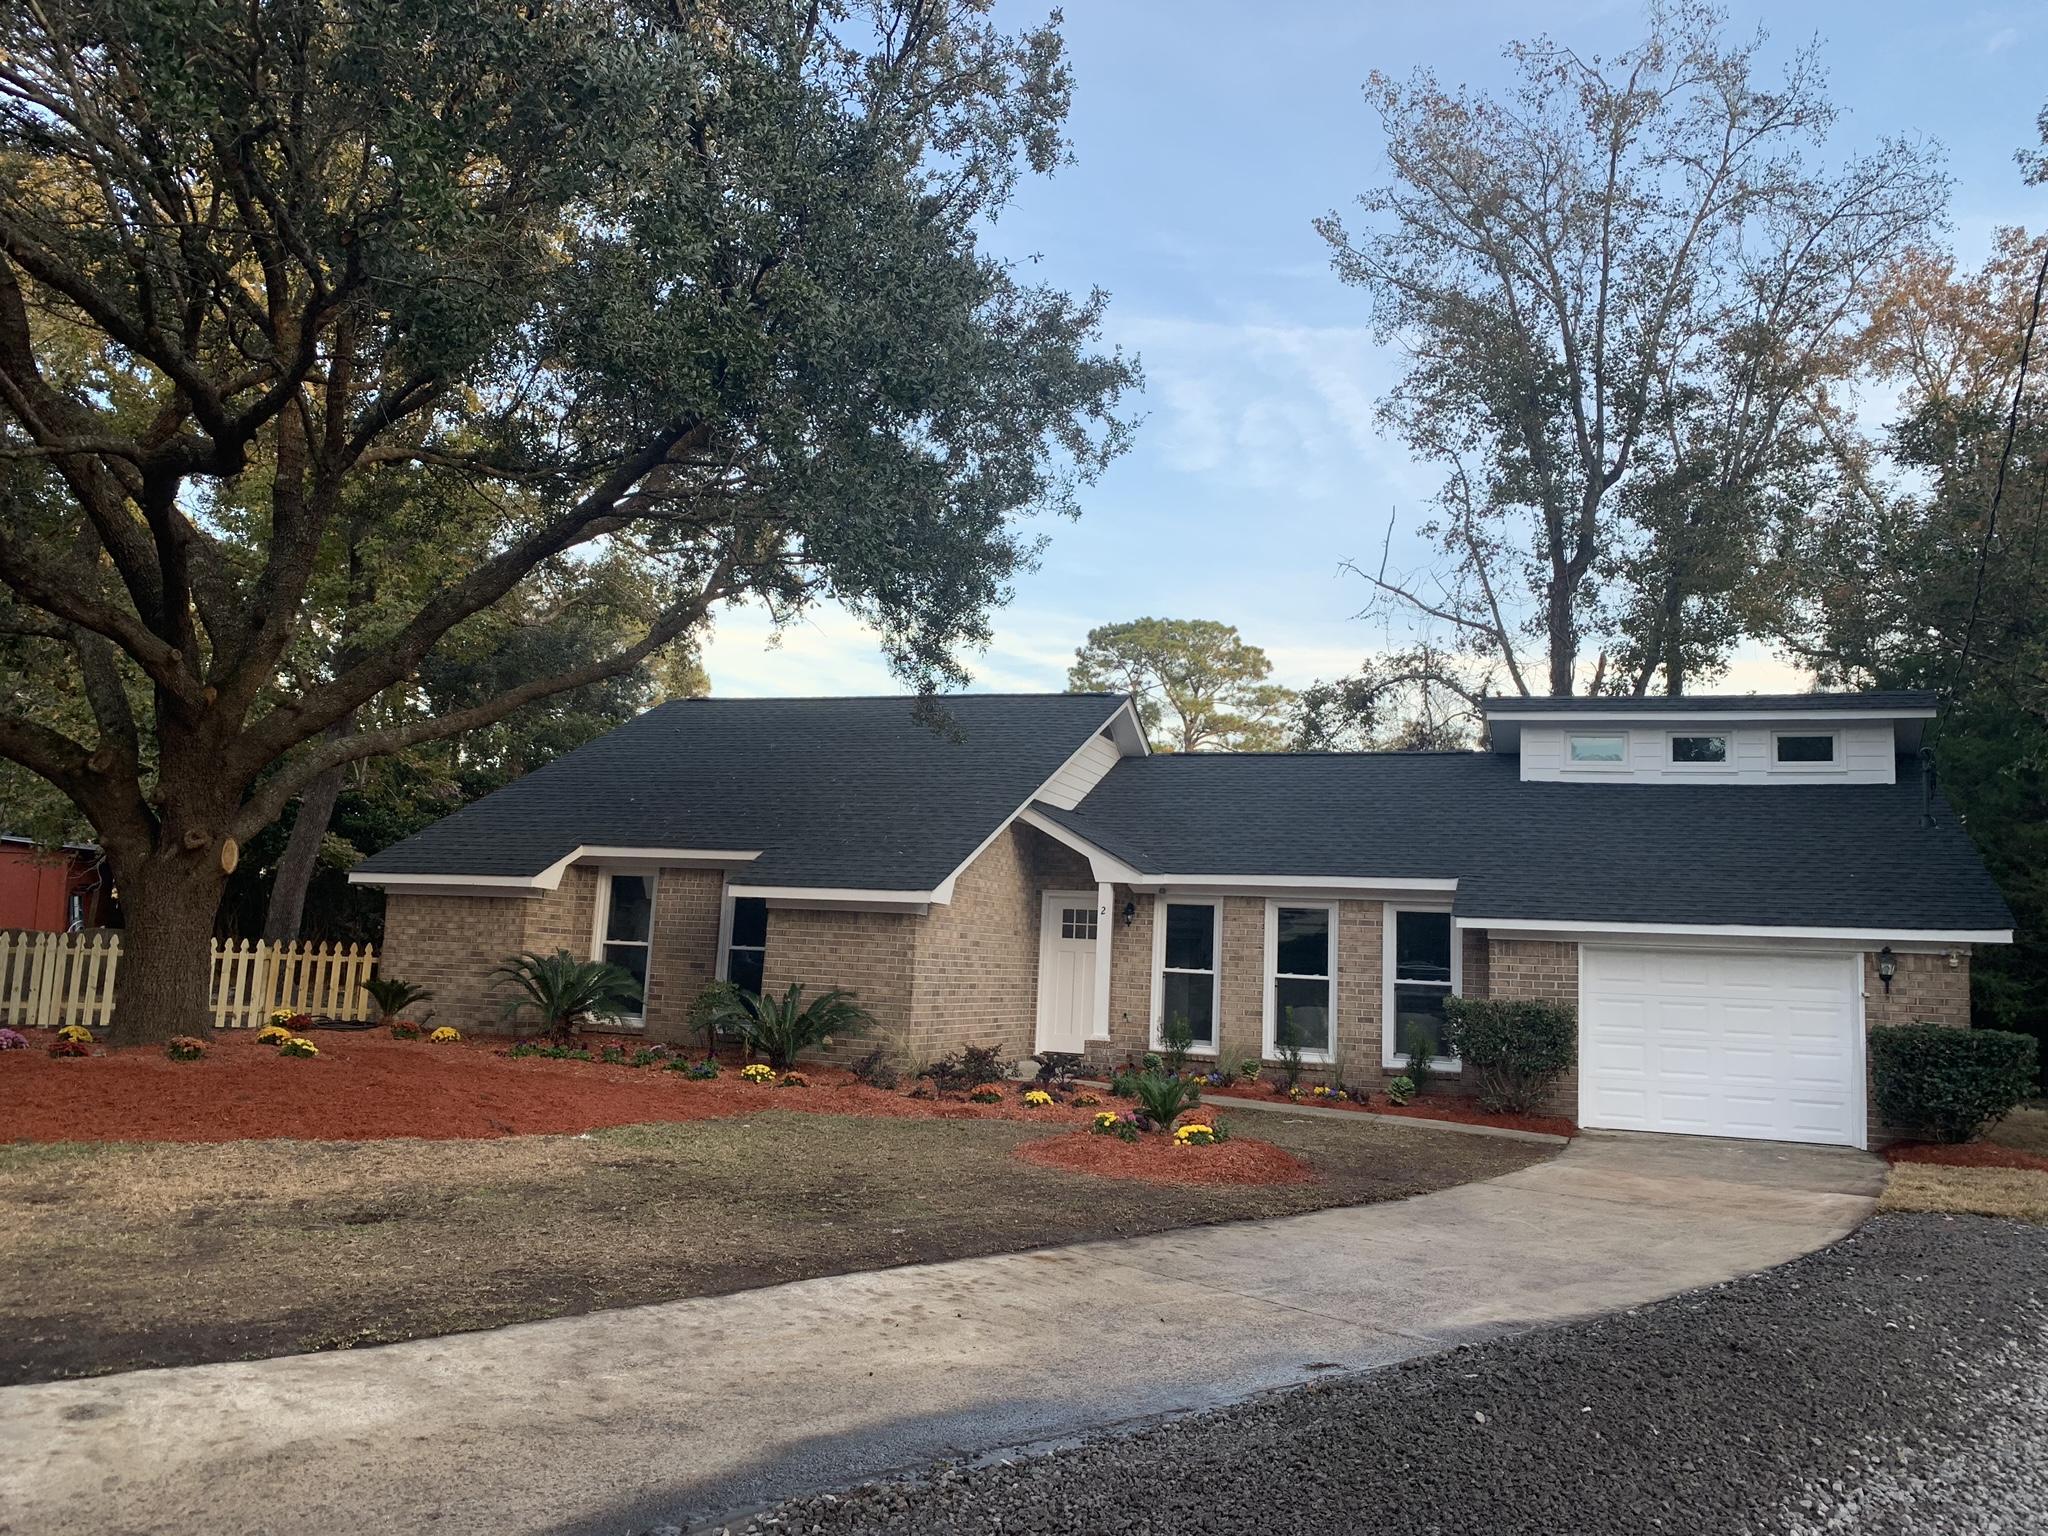 Heathwood Ext Homes For Sale - 2 Blaine, Charleston, SC - 14